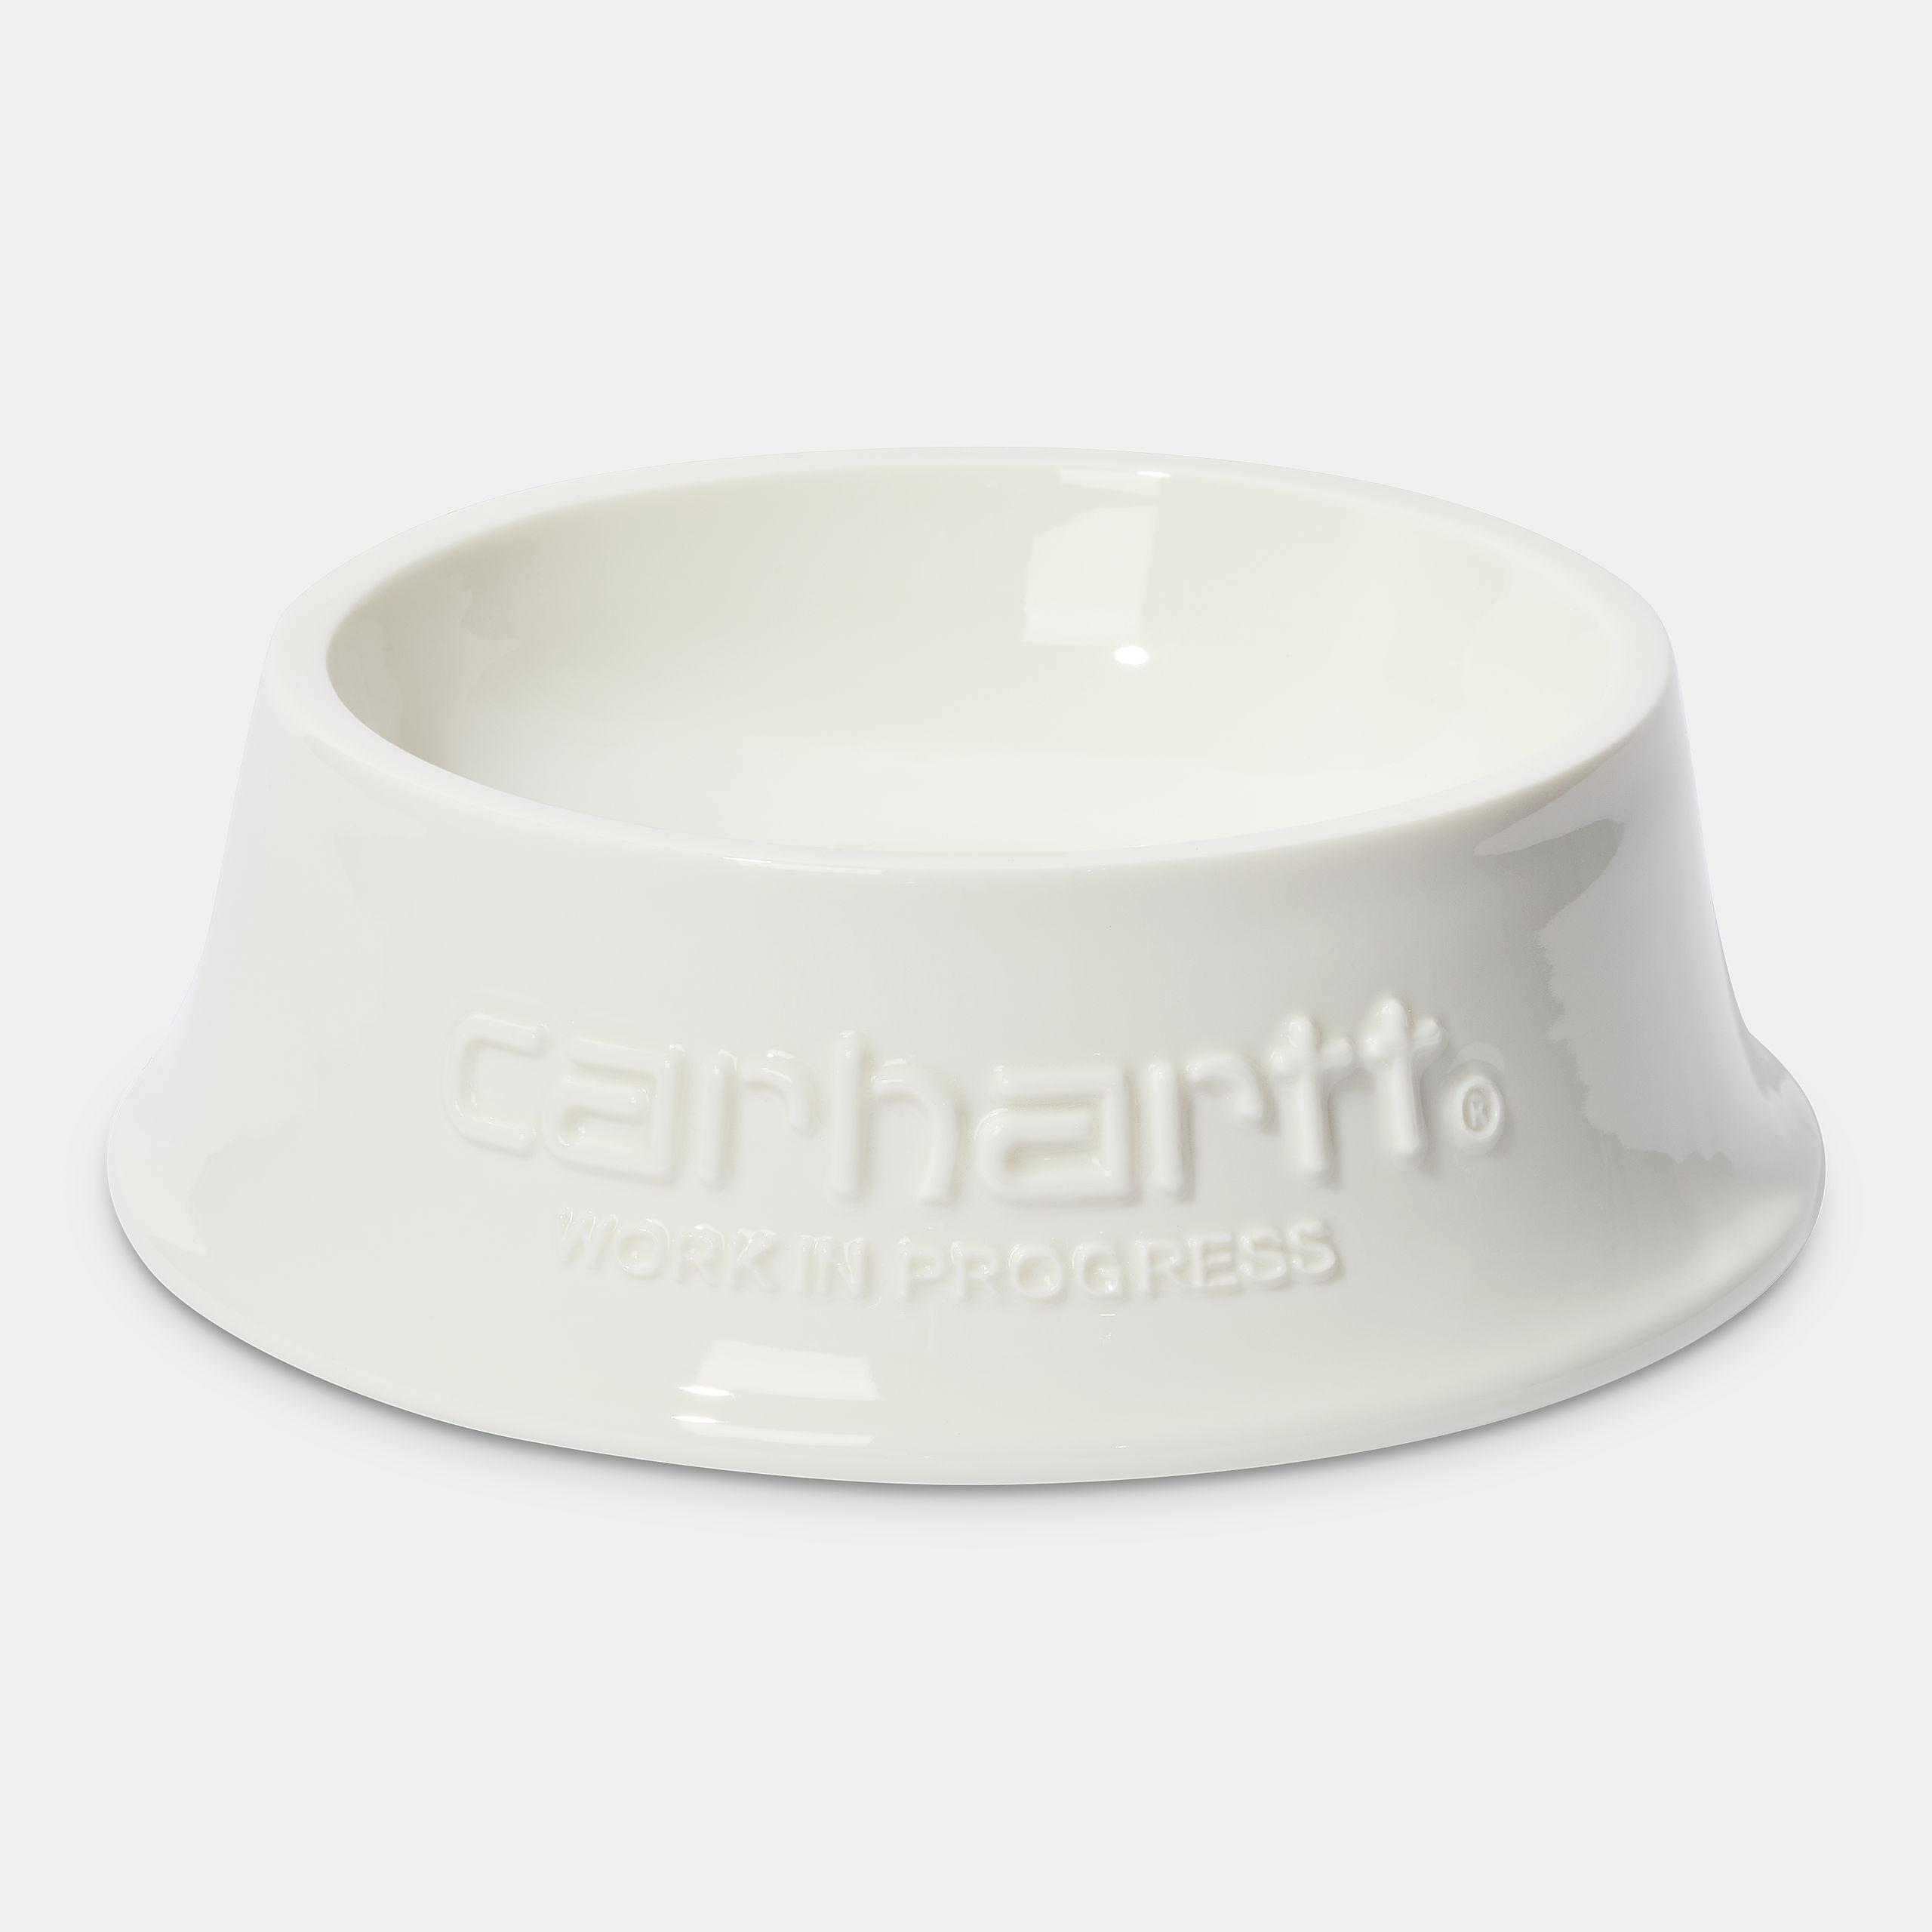 Carhartt WIP - AIRWAVES DOG BOWL - Ceramic Wax